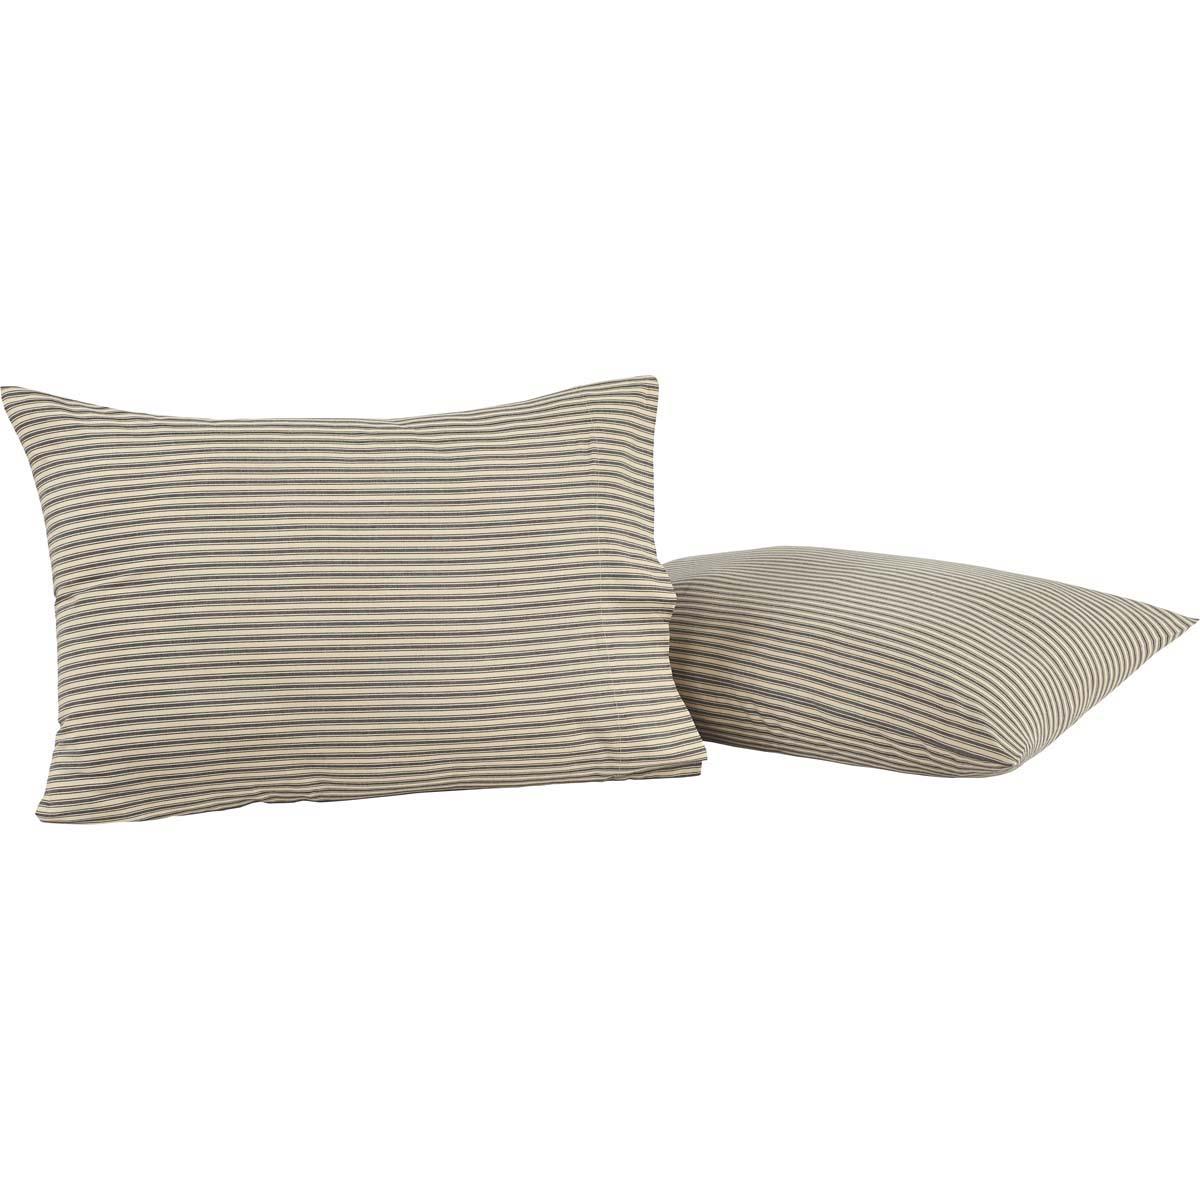 Kendra Stripe Black Standard Pillow Case Set of 2 21x30